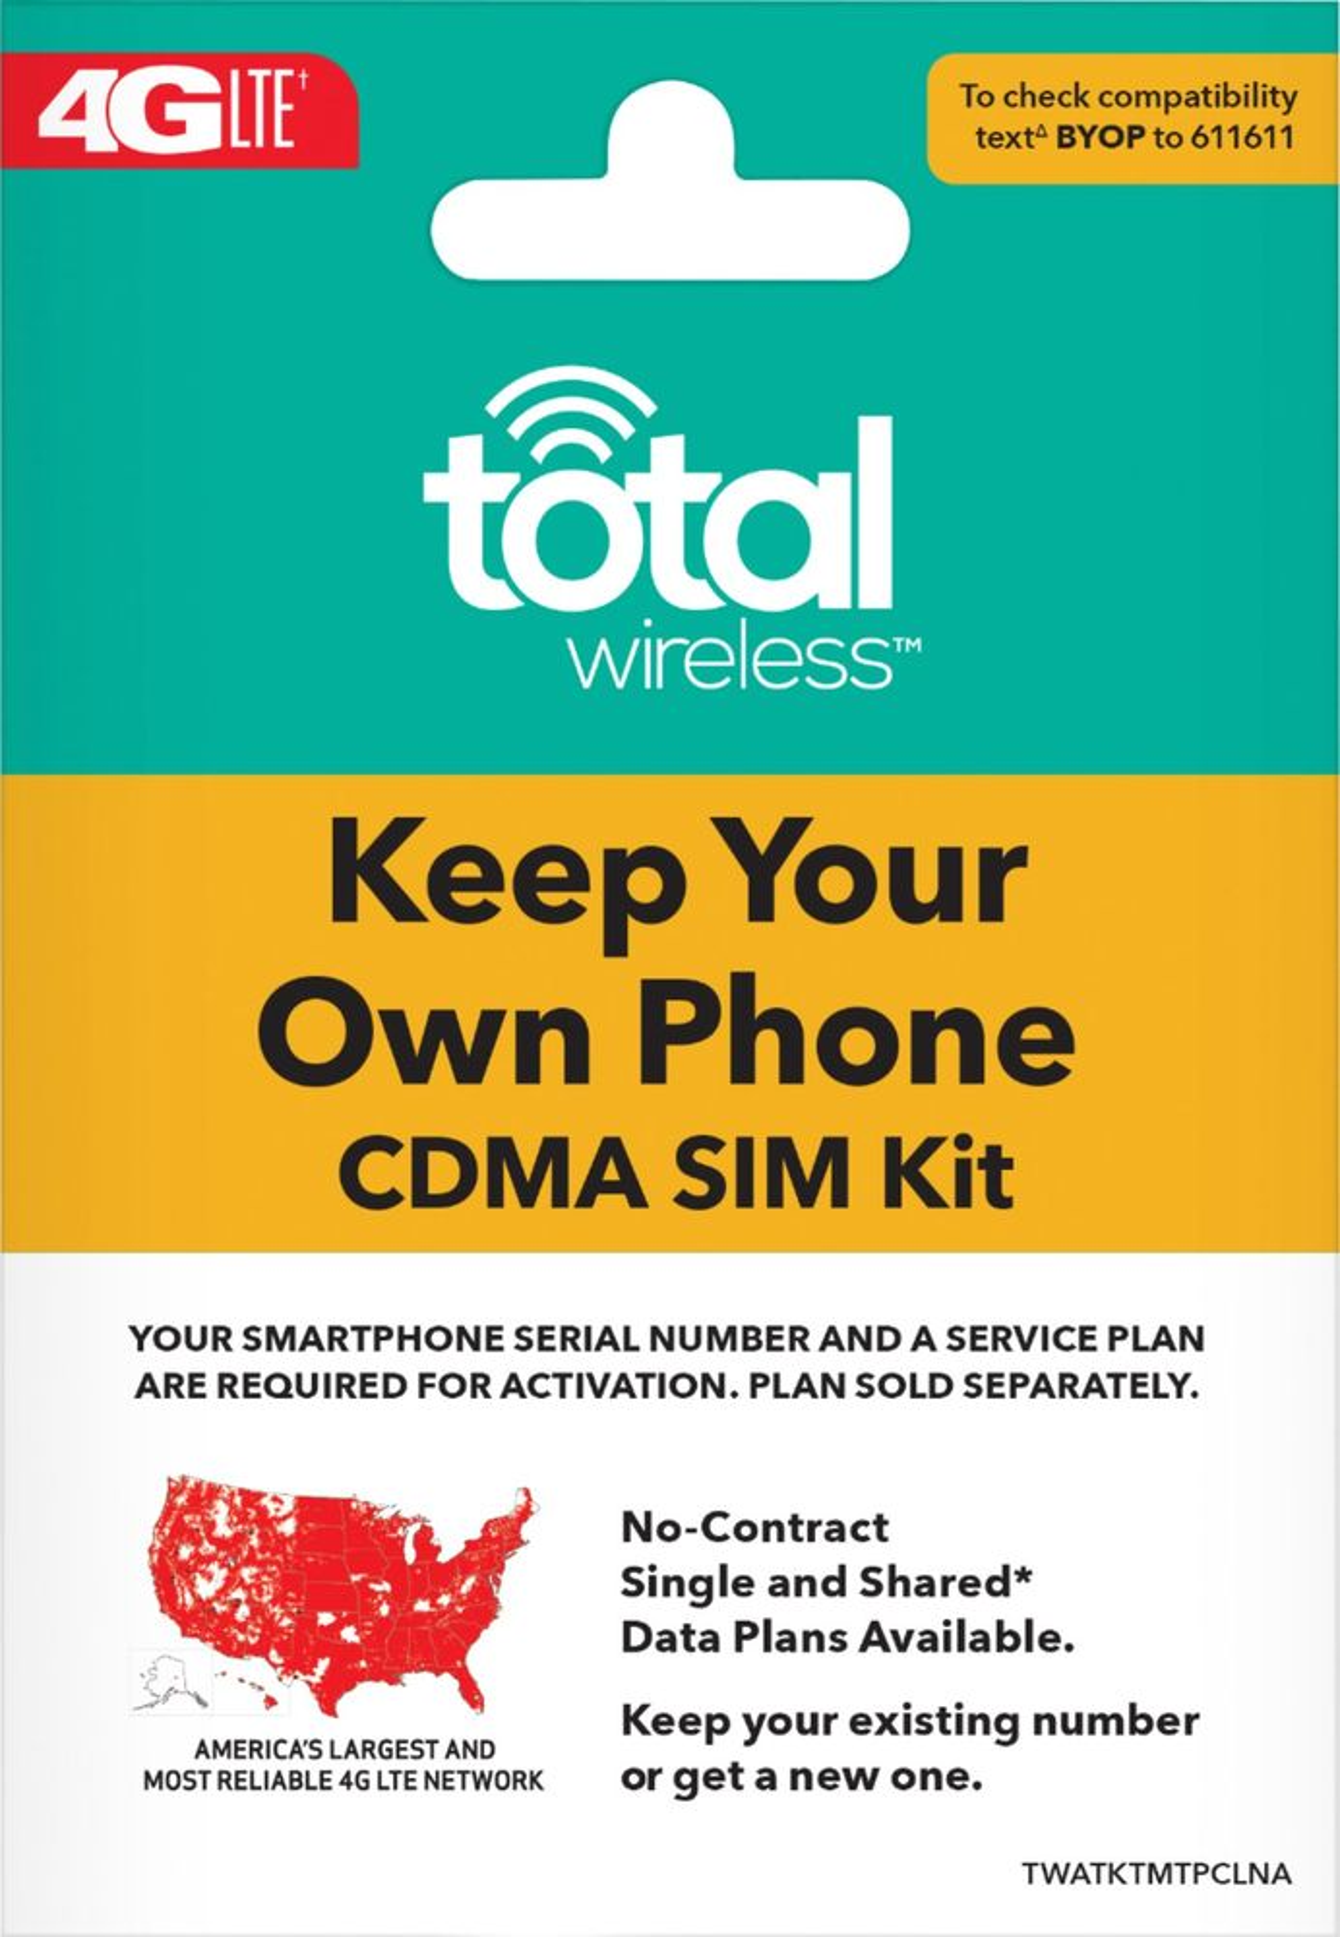 Total Wireless TWATKTMCNA-TRI1 largeFrontImage